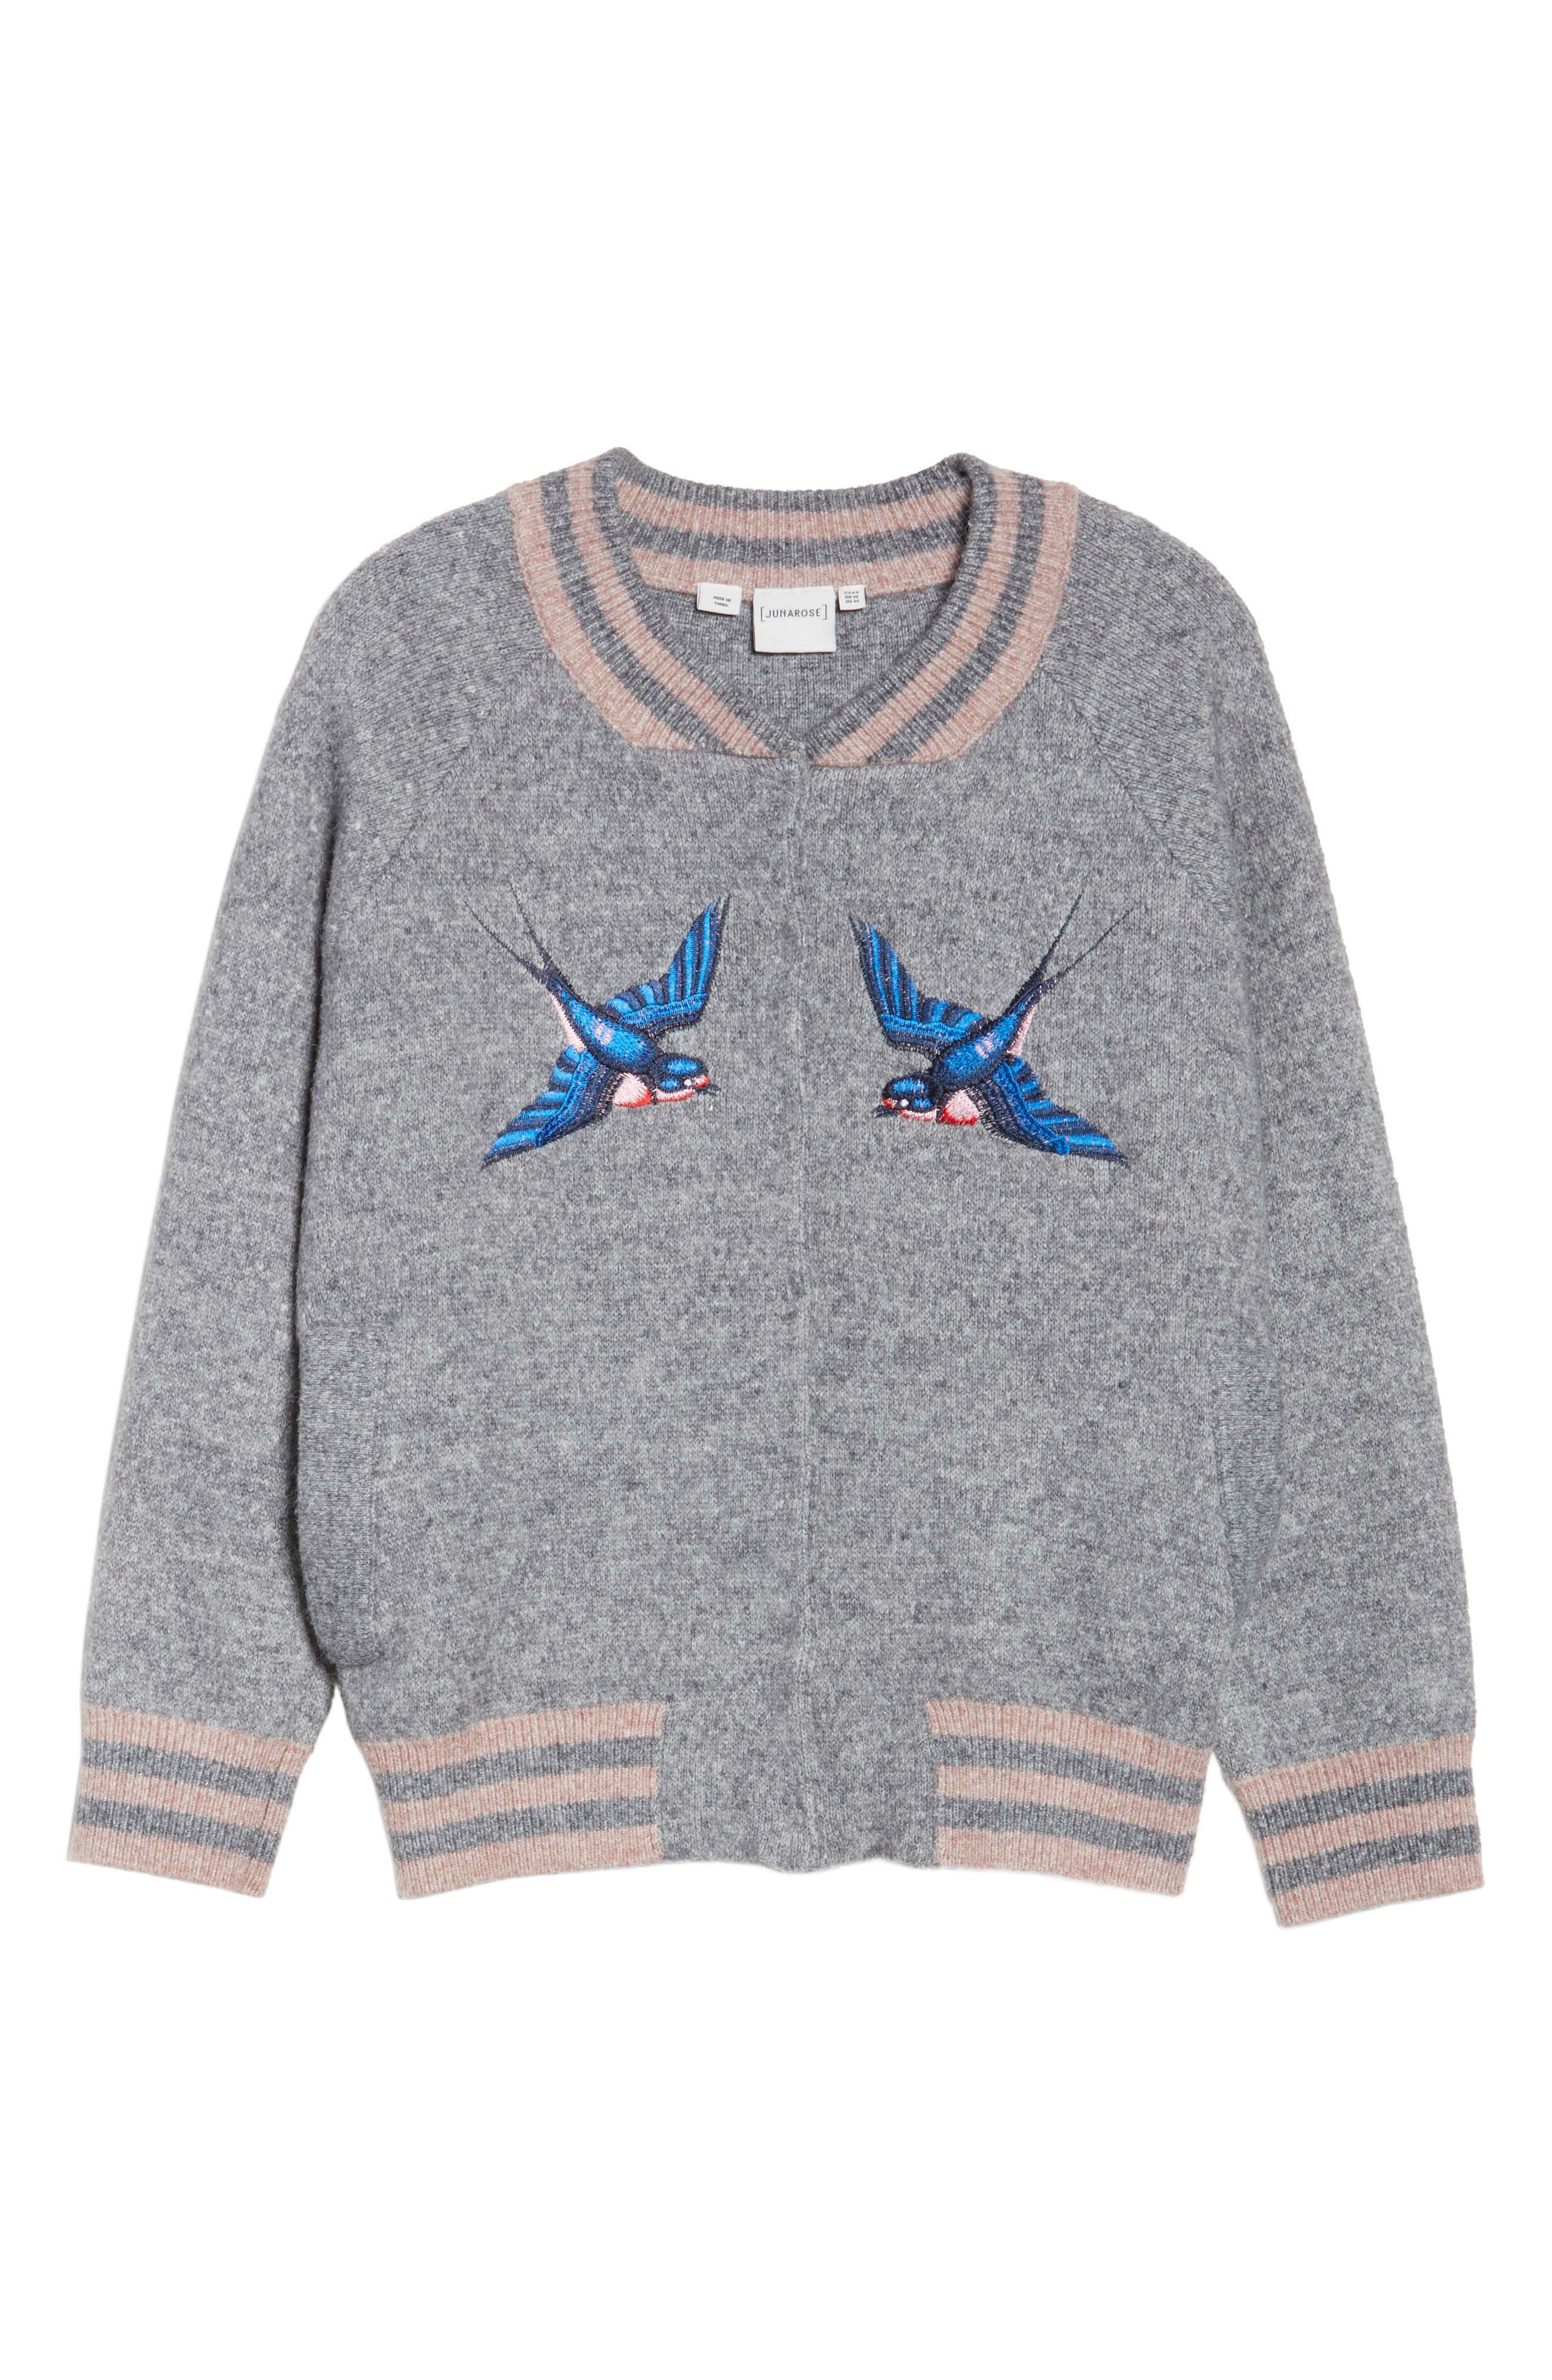 Zanja Embroidered Knit Bomber Jacket,                             Alternate thumbnail 5, color,